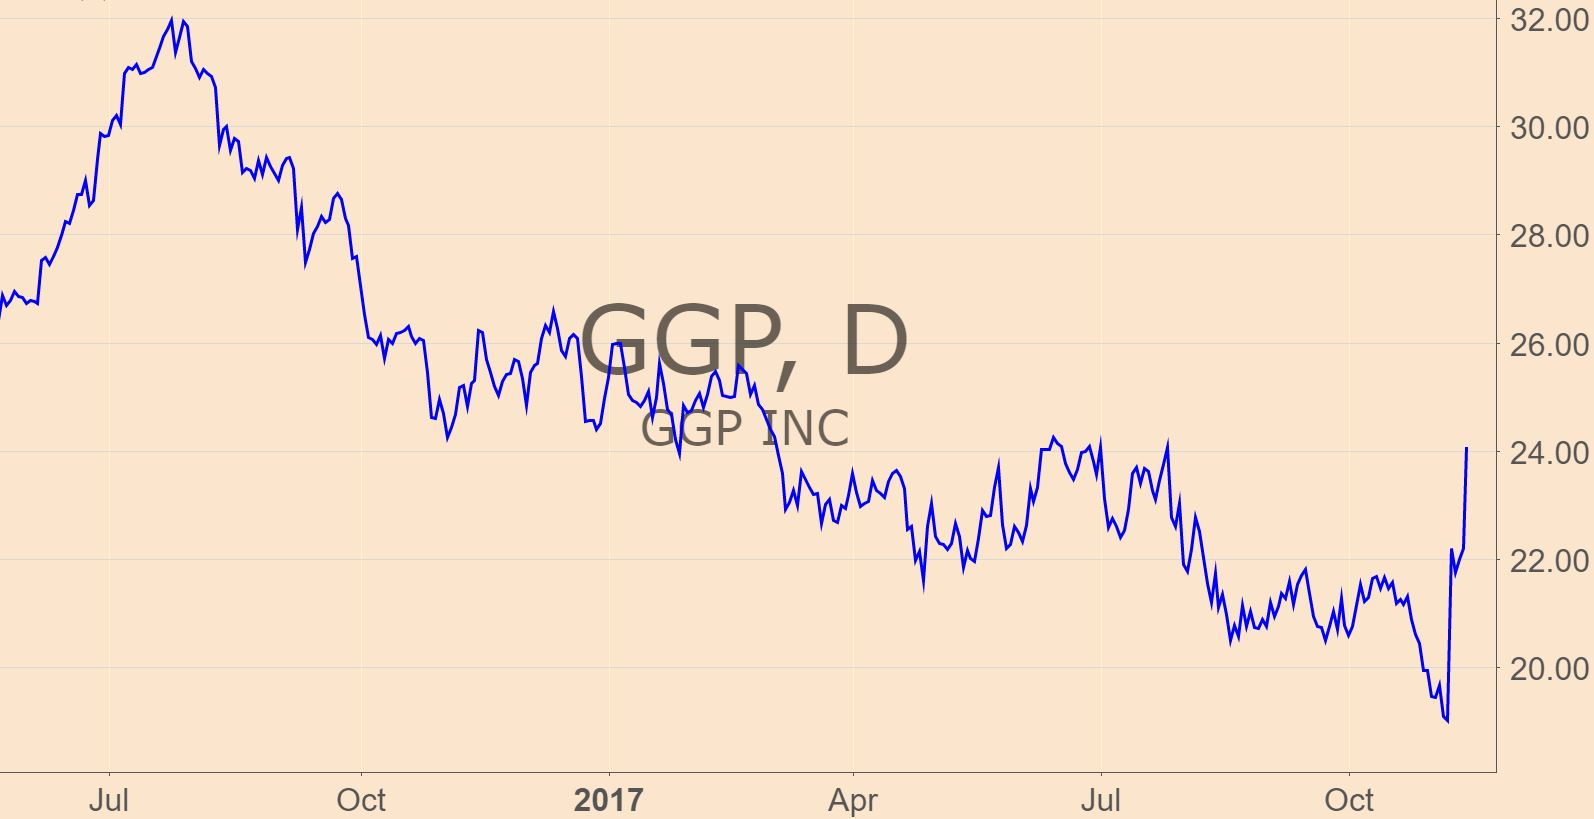 Yastine-GGP chart